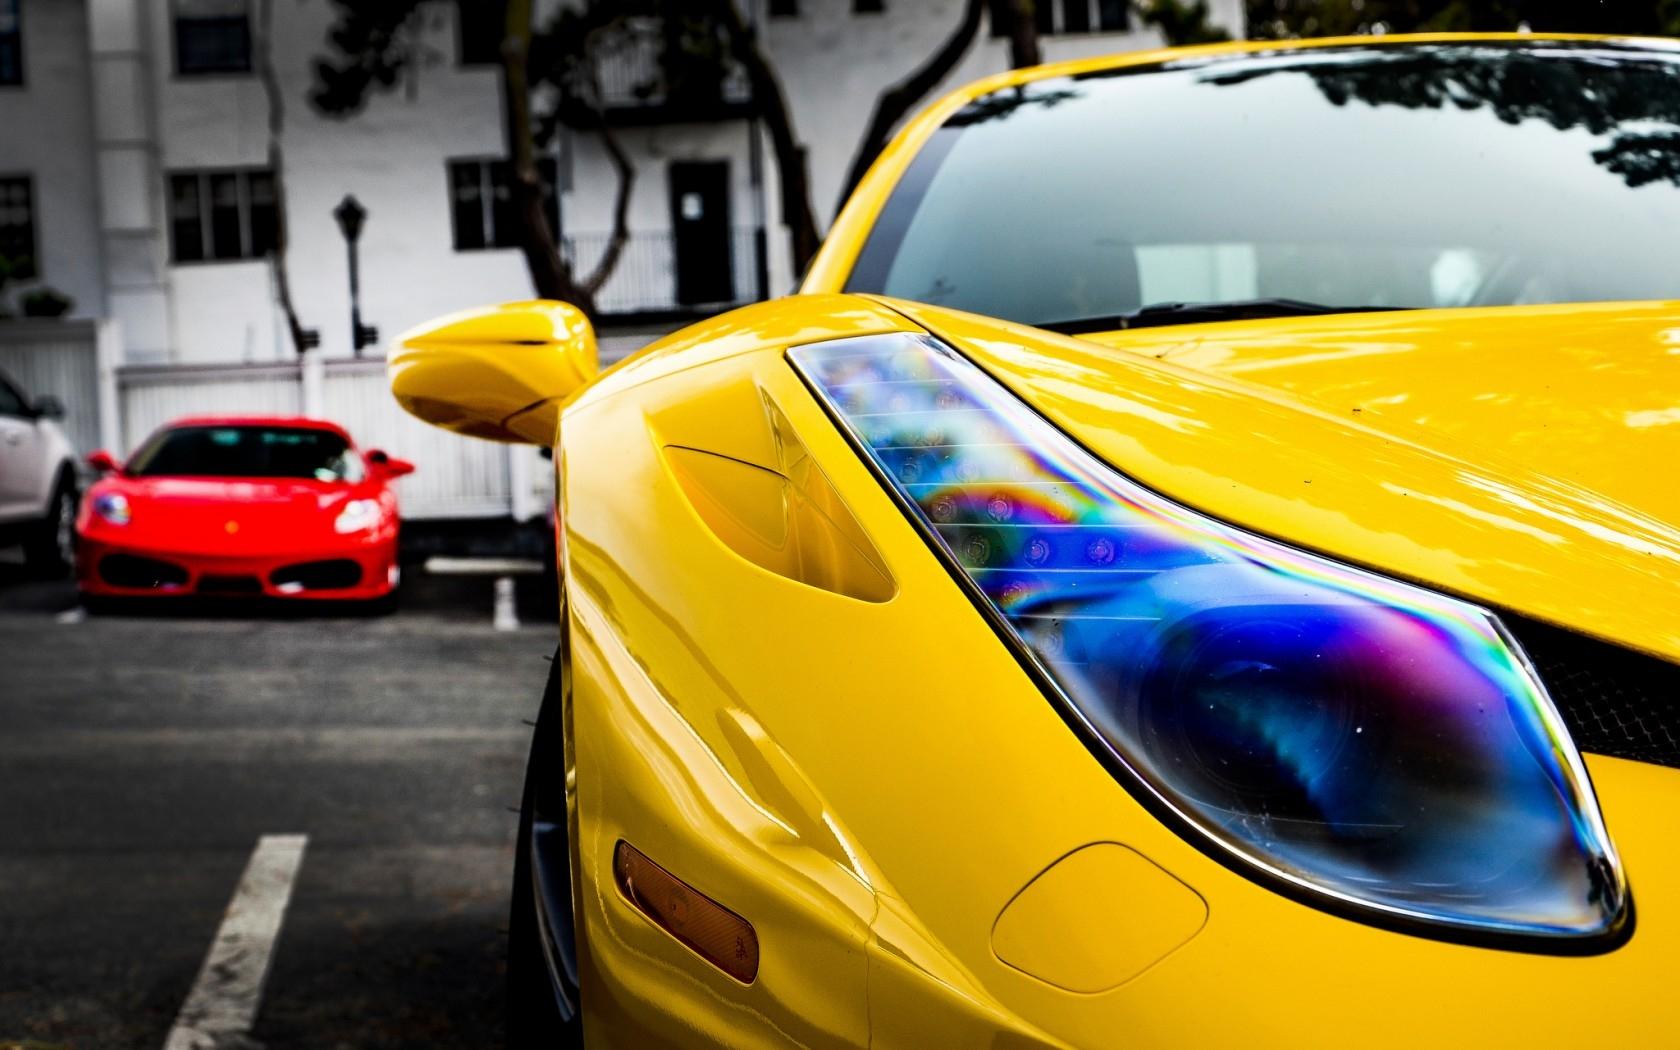 Яркие картинки на машину